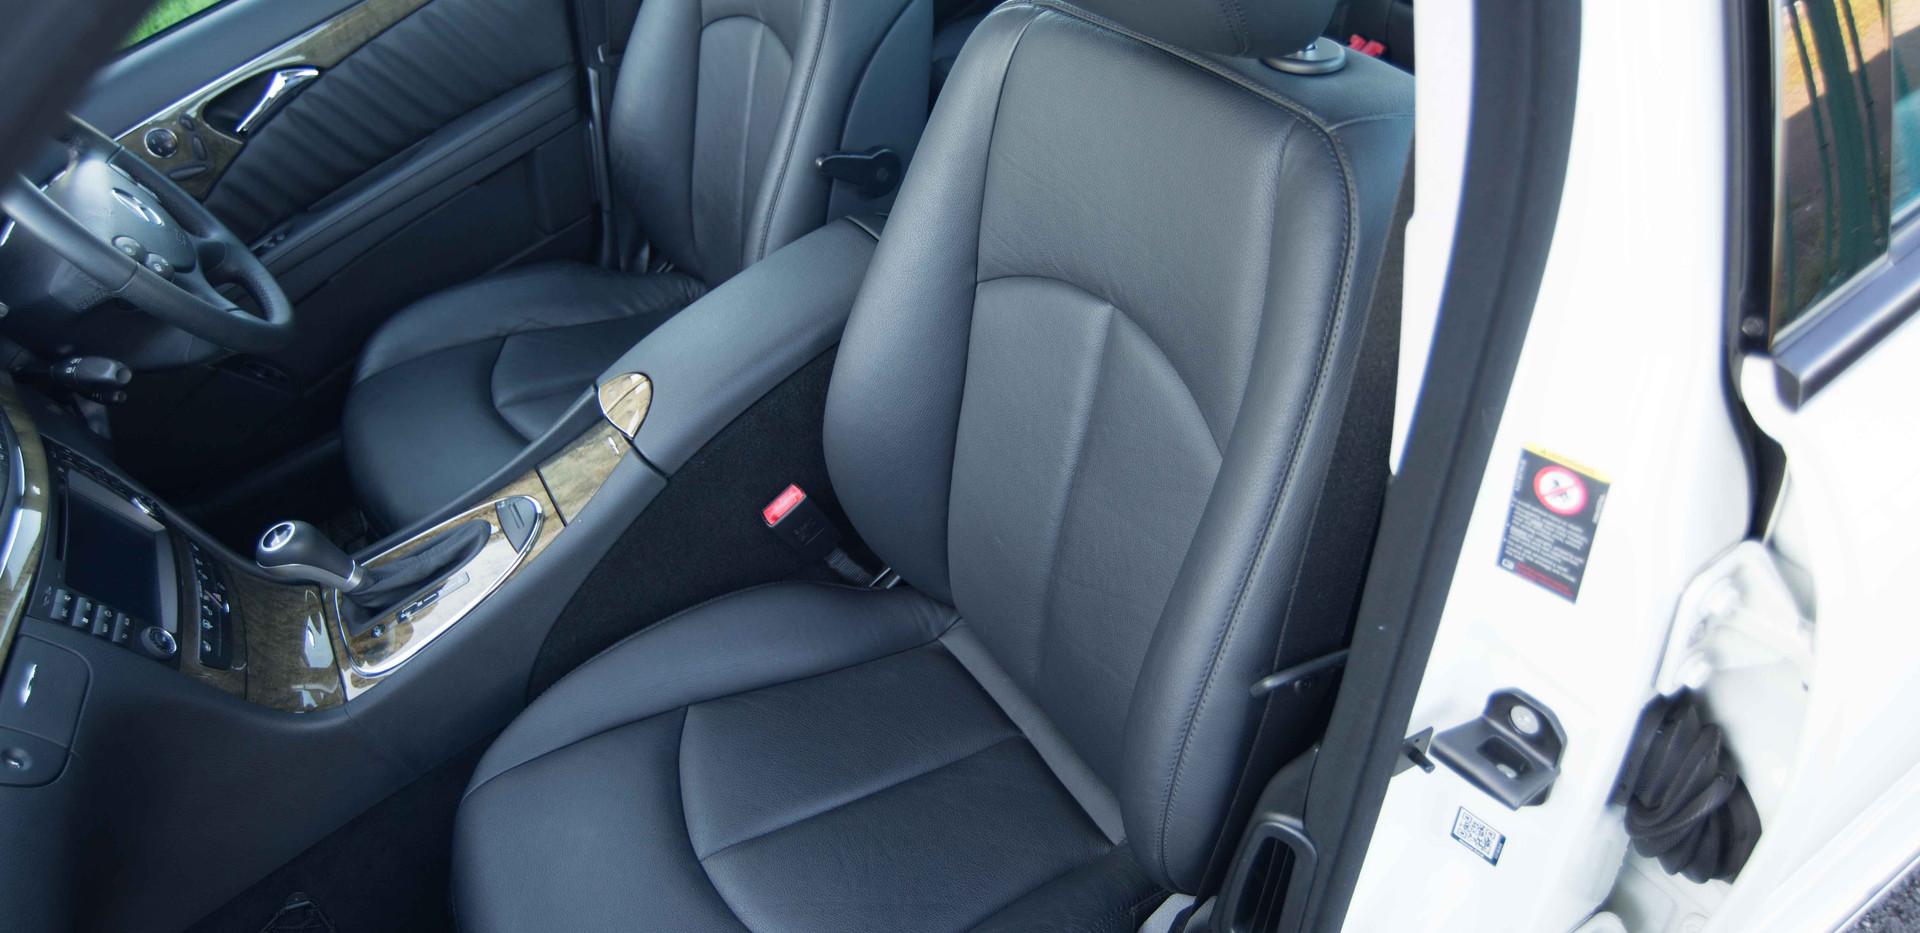 Mercedes E350 For Sale UK London  (45 of